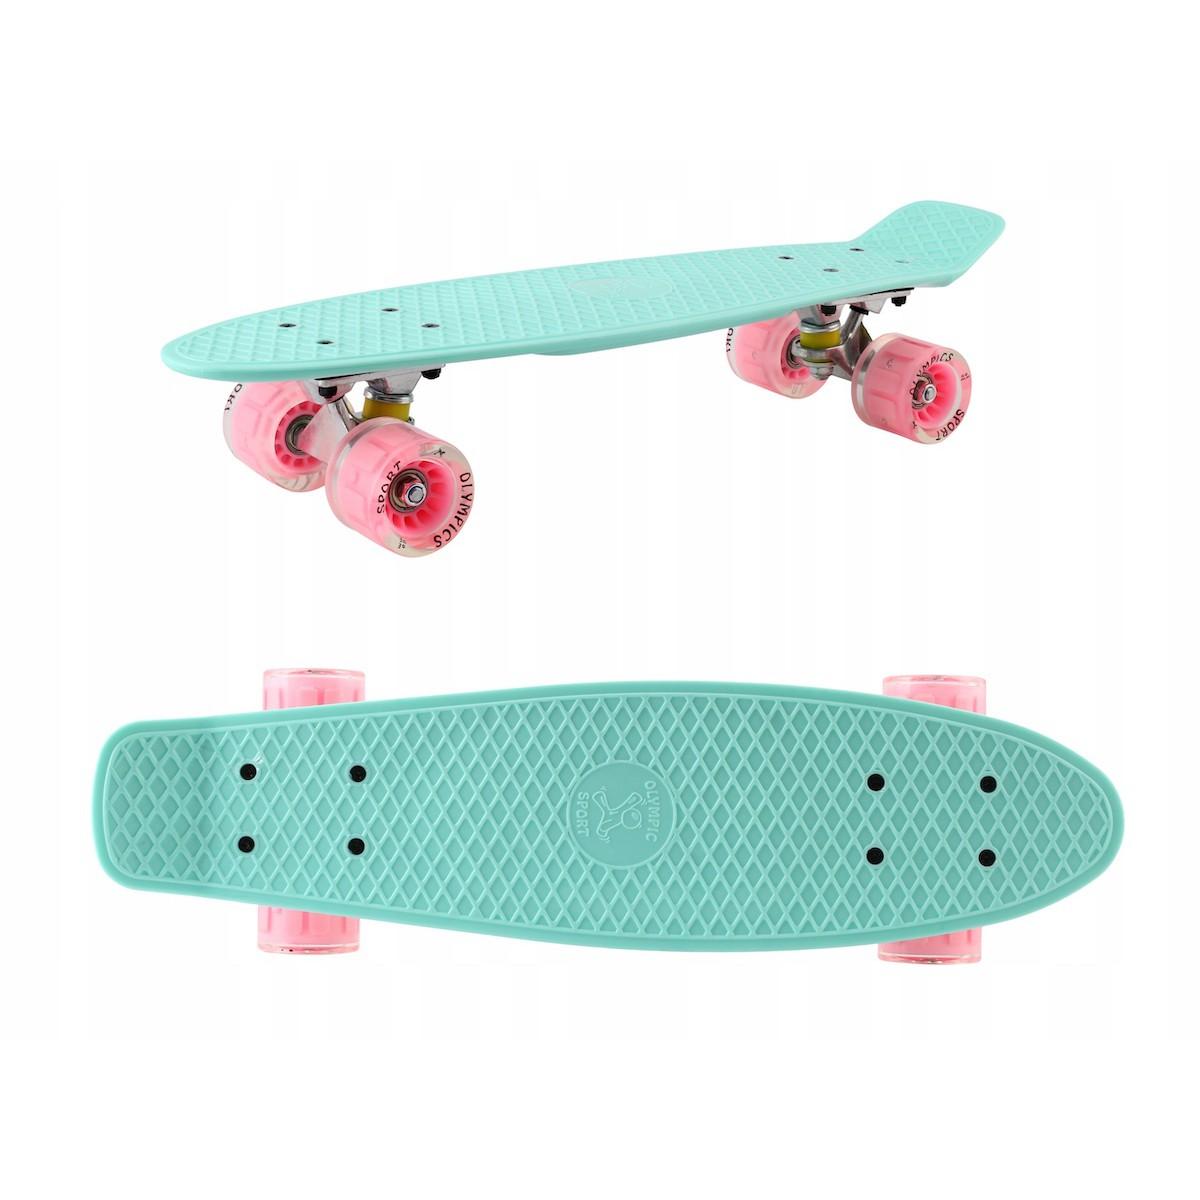 Skateboard 56cm LED svetlá podsvietené kolesá megamix.sk